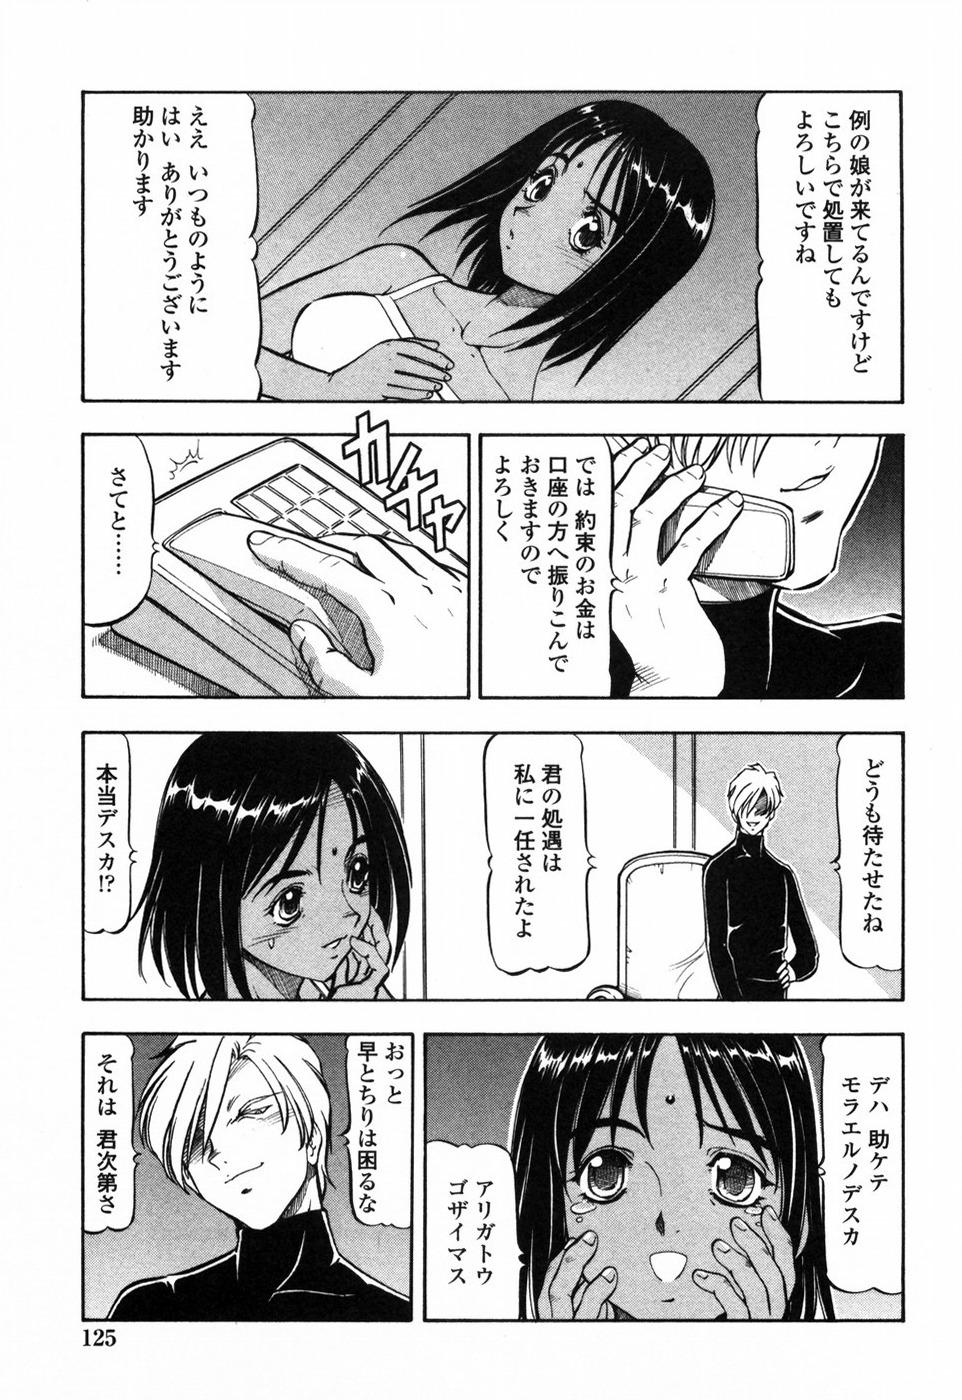 Kichiku Houteishiki - Equation of brutal person 131